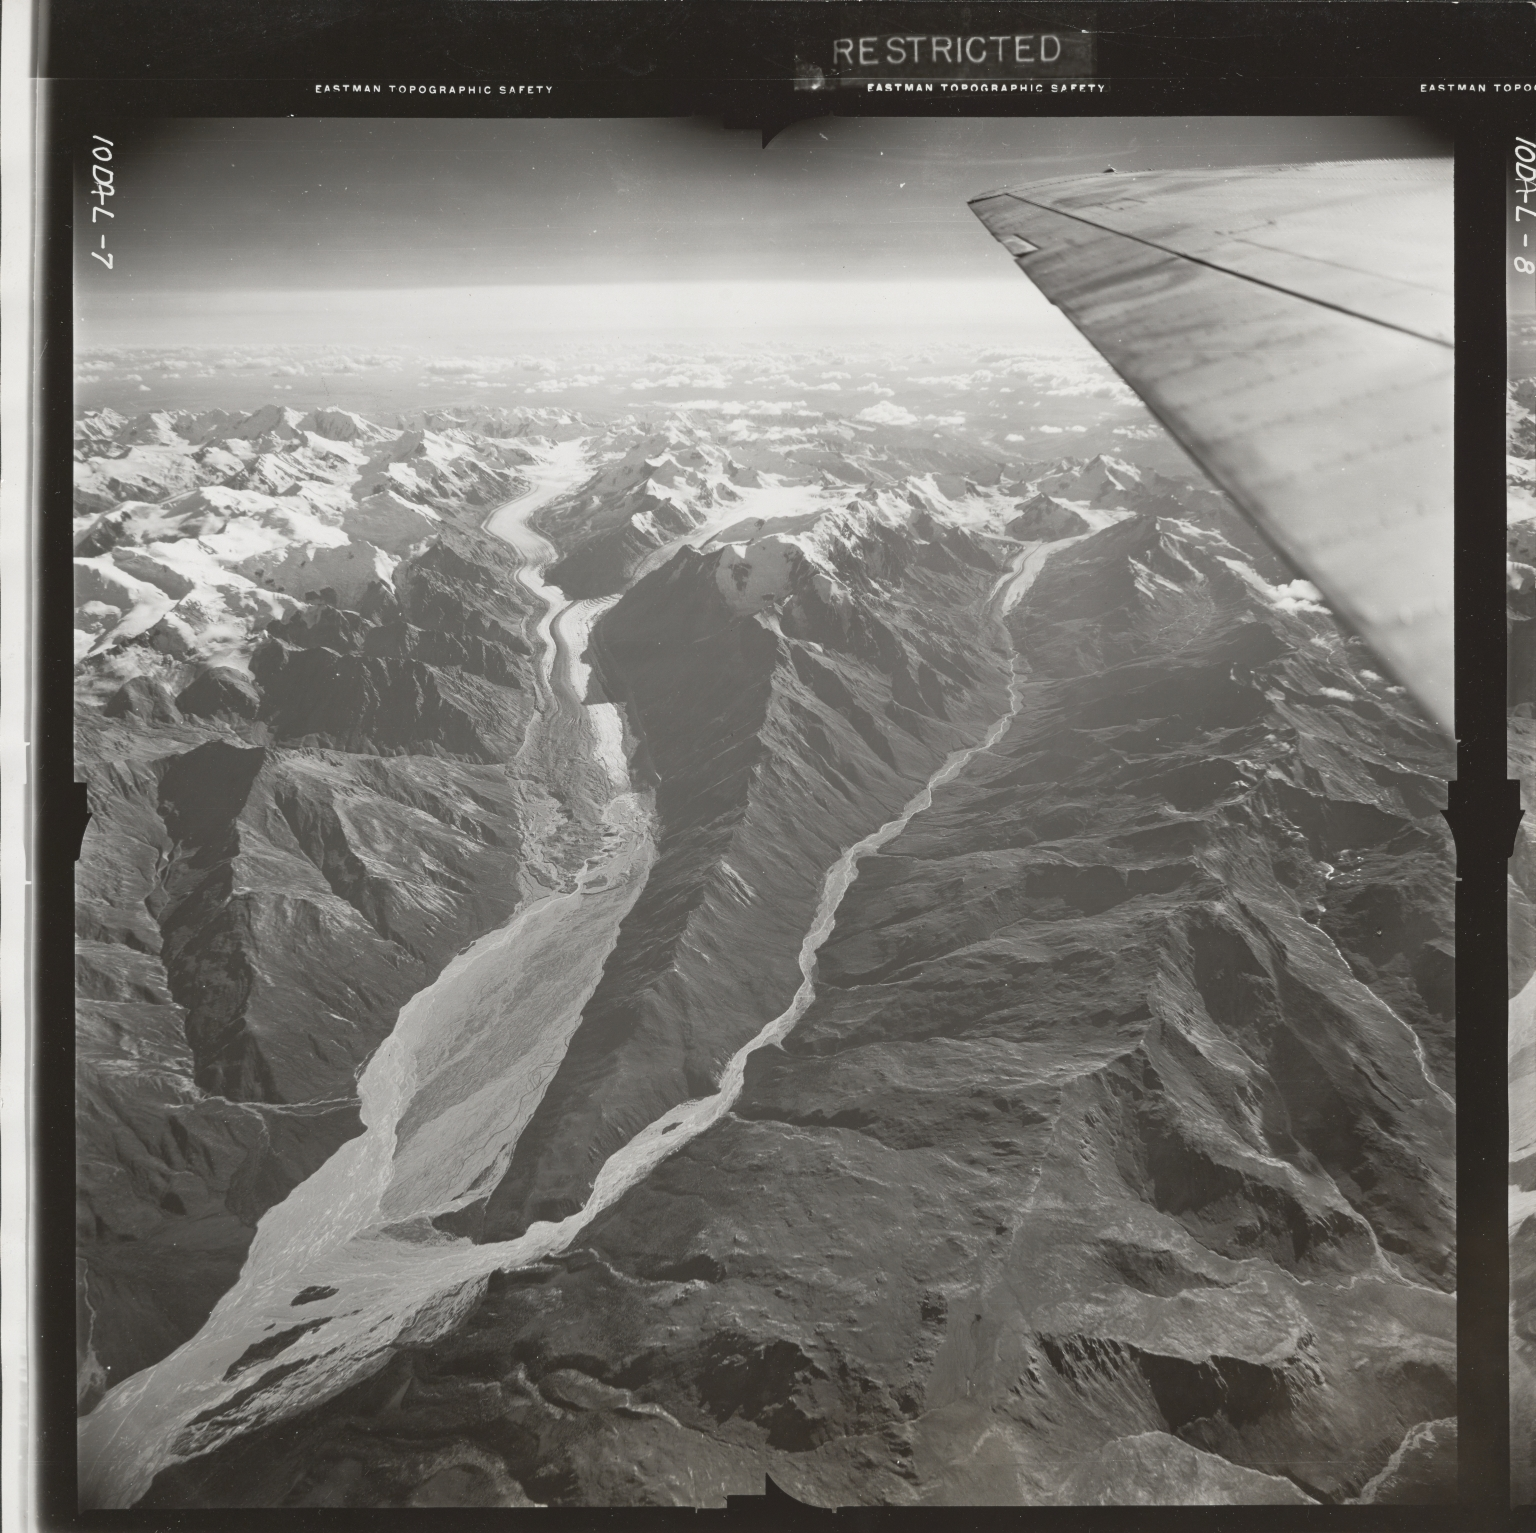 Gerstle River, aerial photograph FL 20 L-7, Alaska